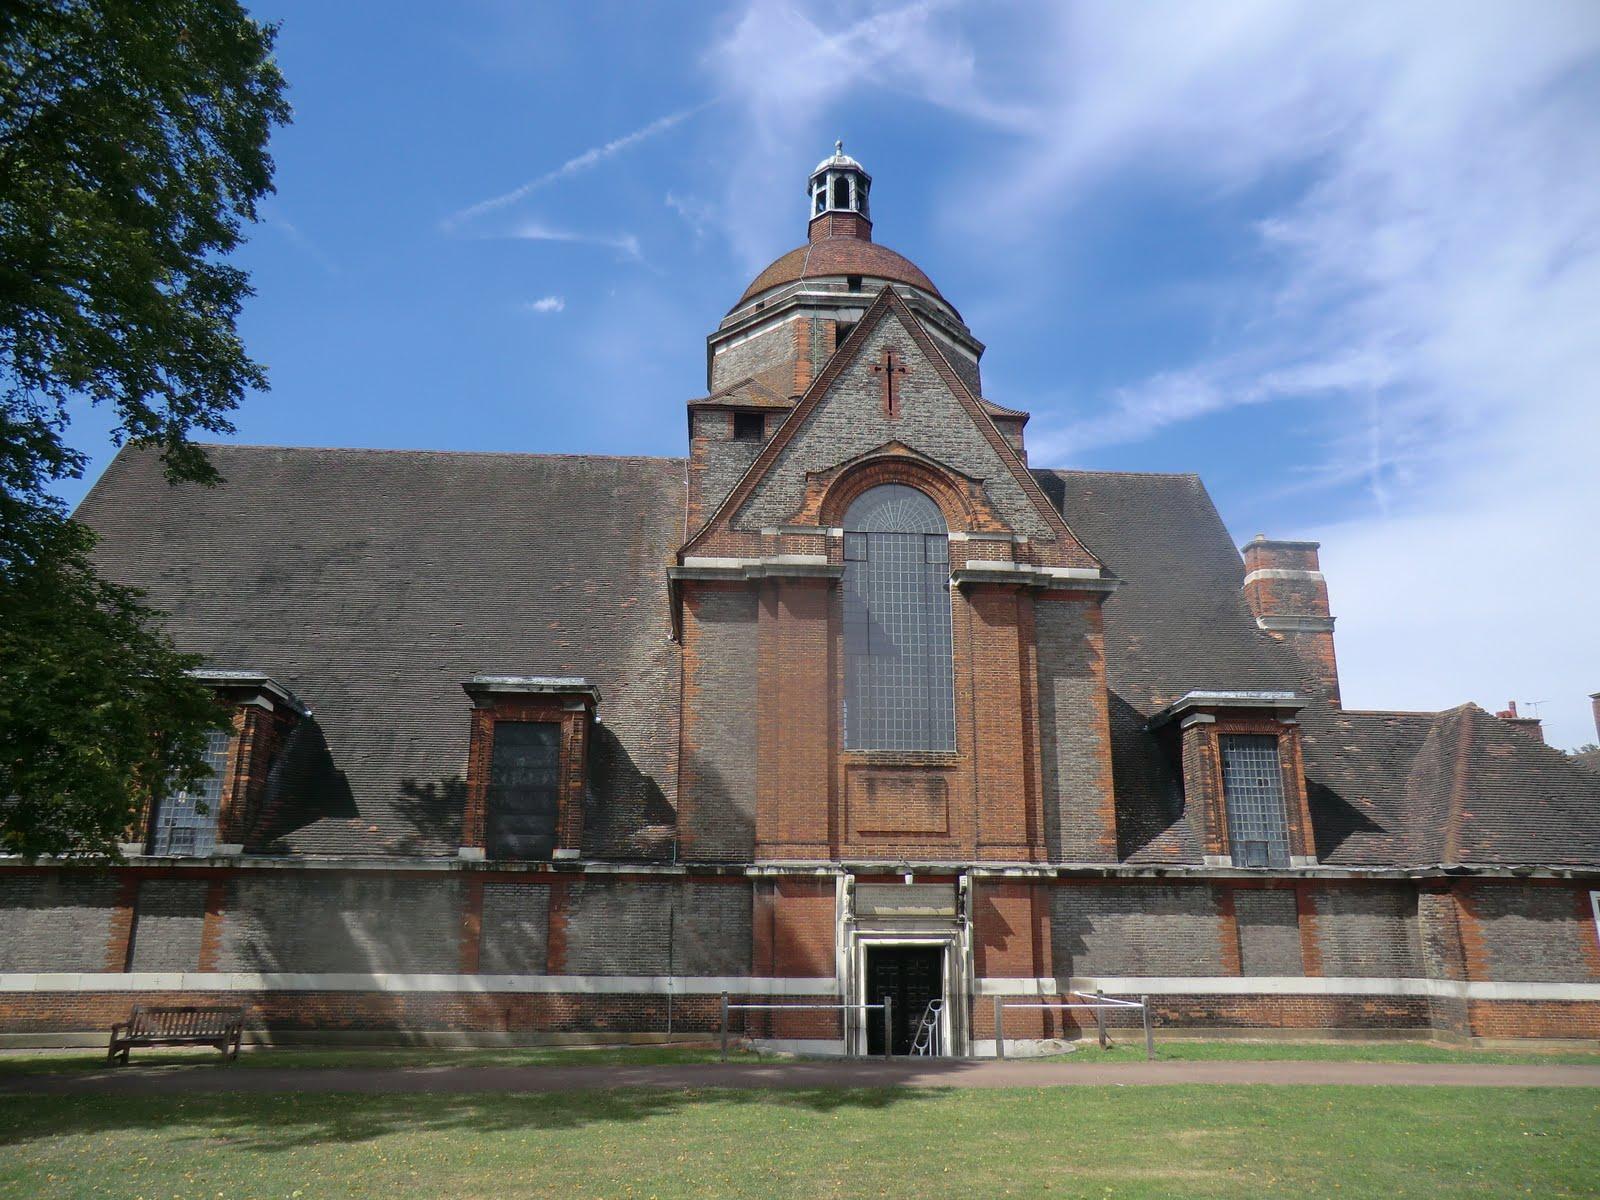 CIMG9570 Free Church, Hampstead Garden Suburb